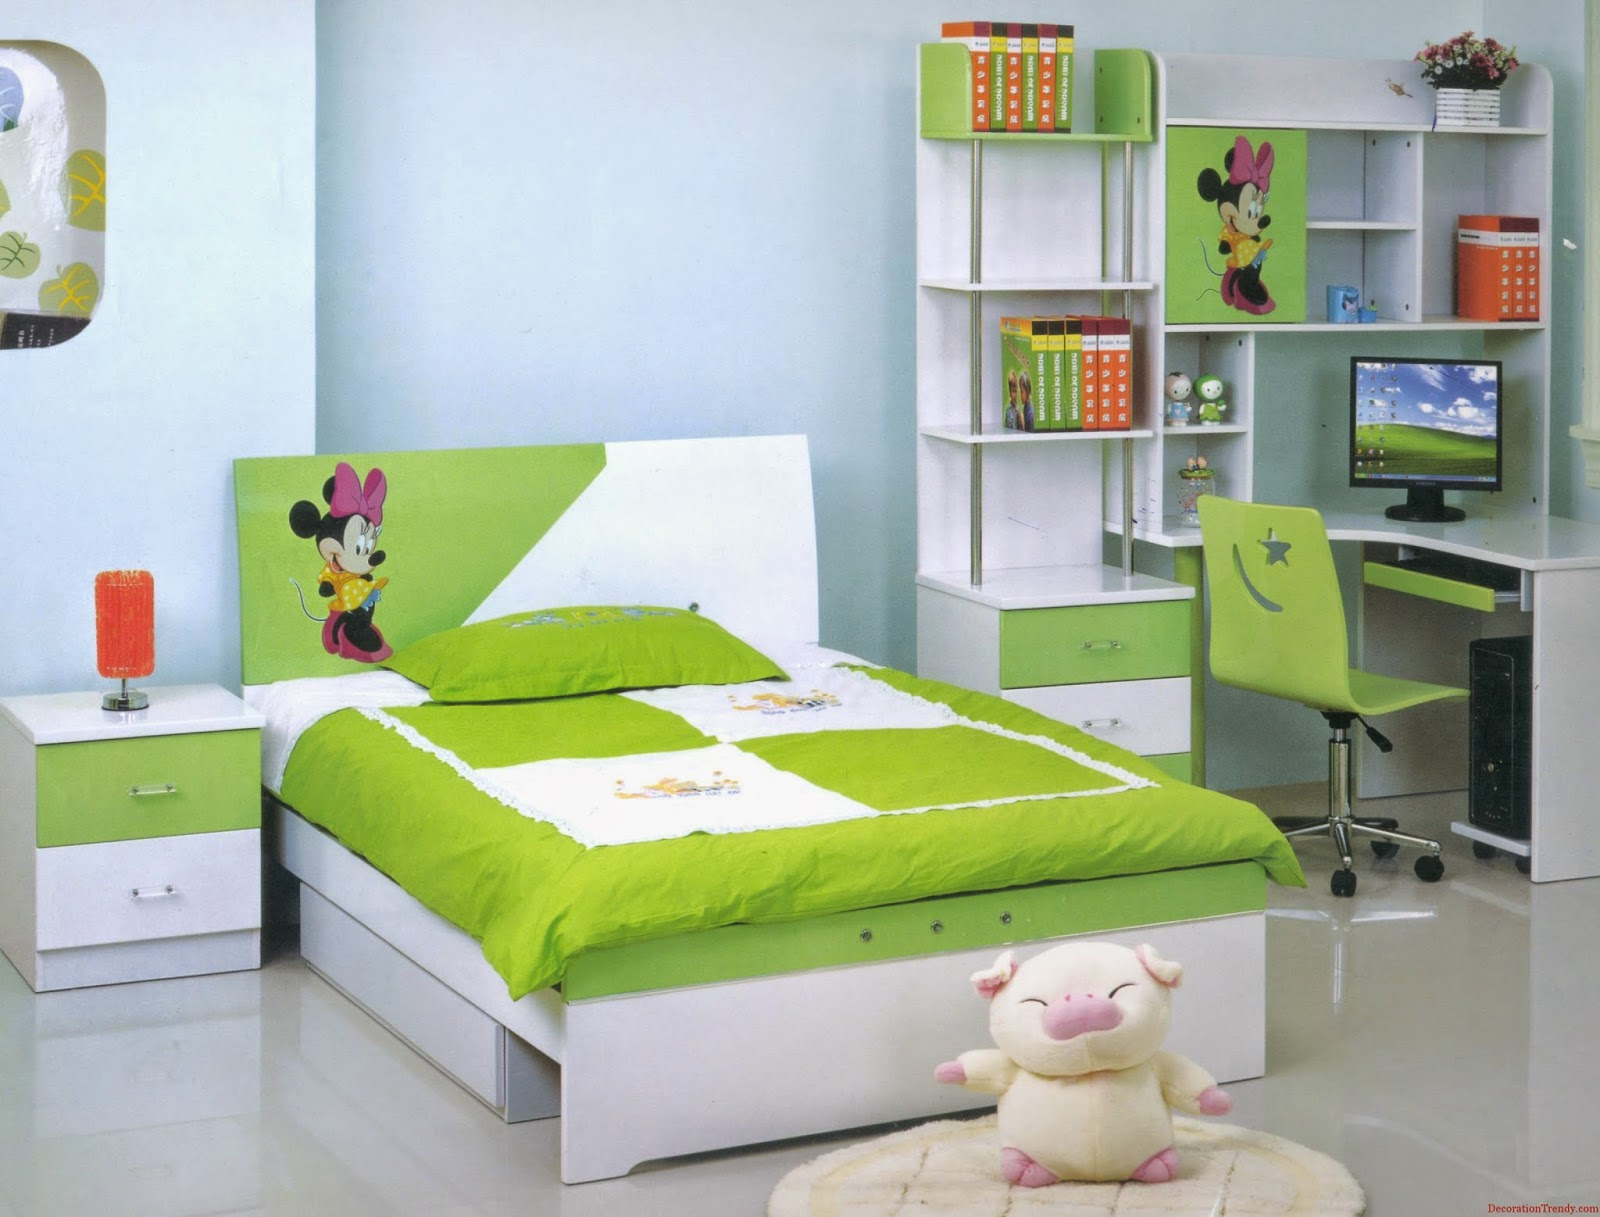 50 Desain Kamar Tidur Anak Perempuan Minimalis Warna Hijau 3000